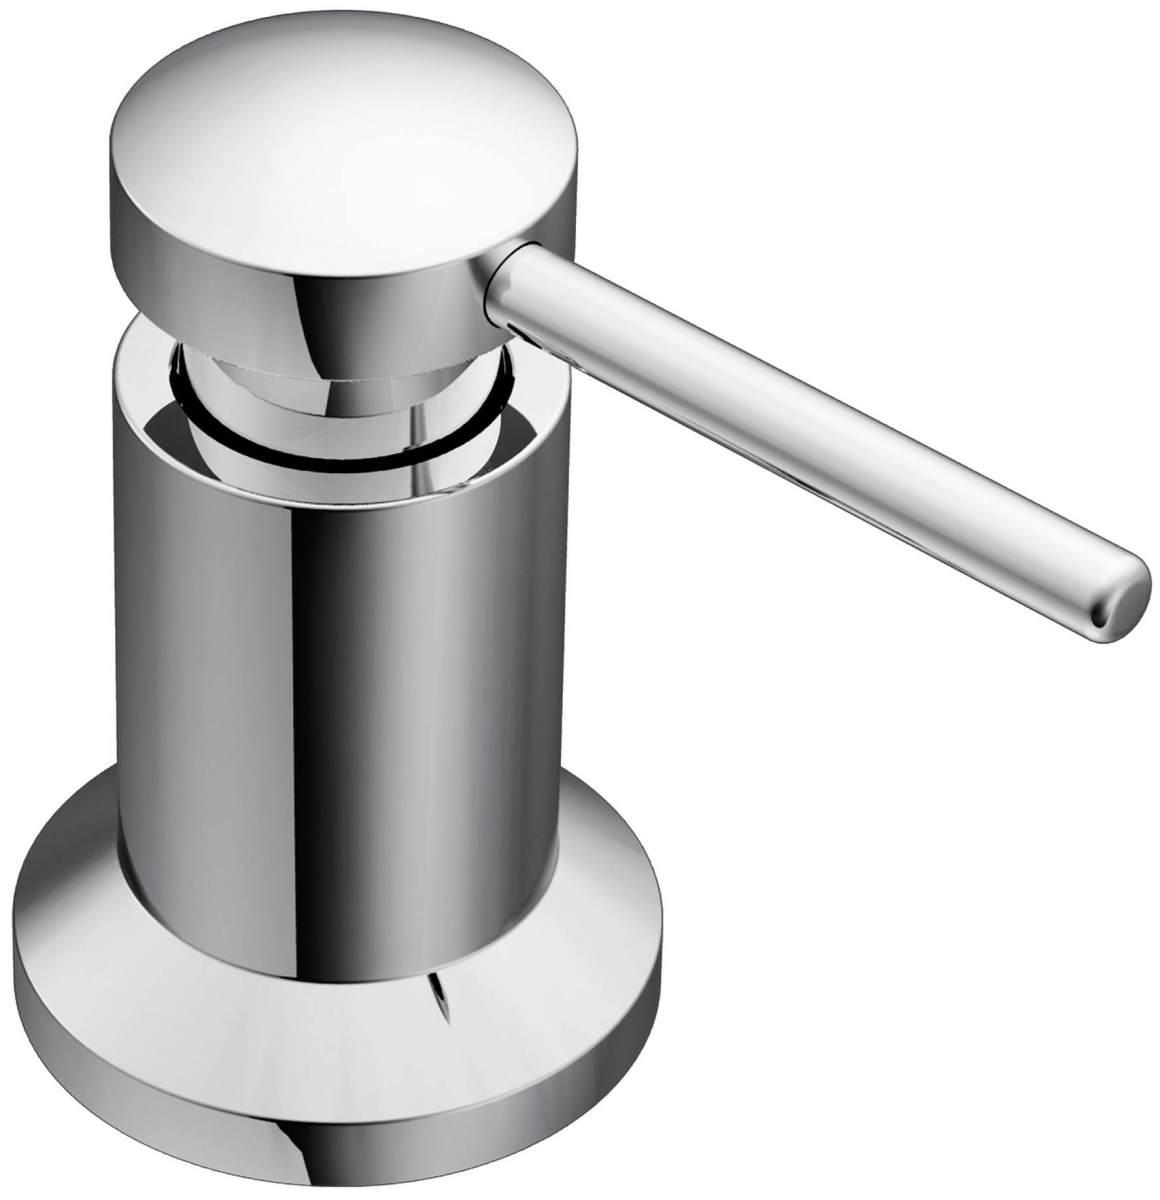 plumbing fixtures for the kitchen kitchen sink soap dispenser Moen Core soap dispenser in chrome